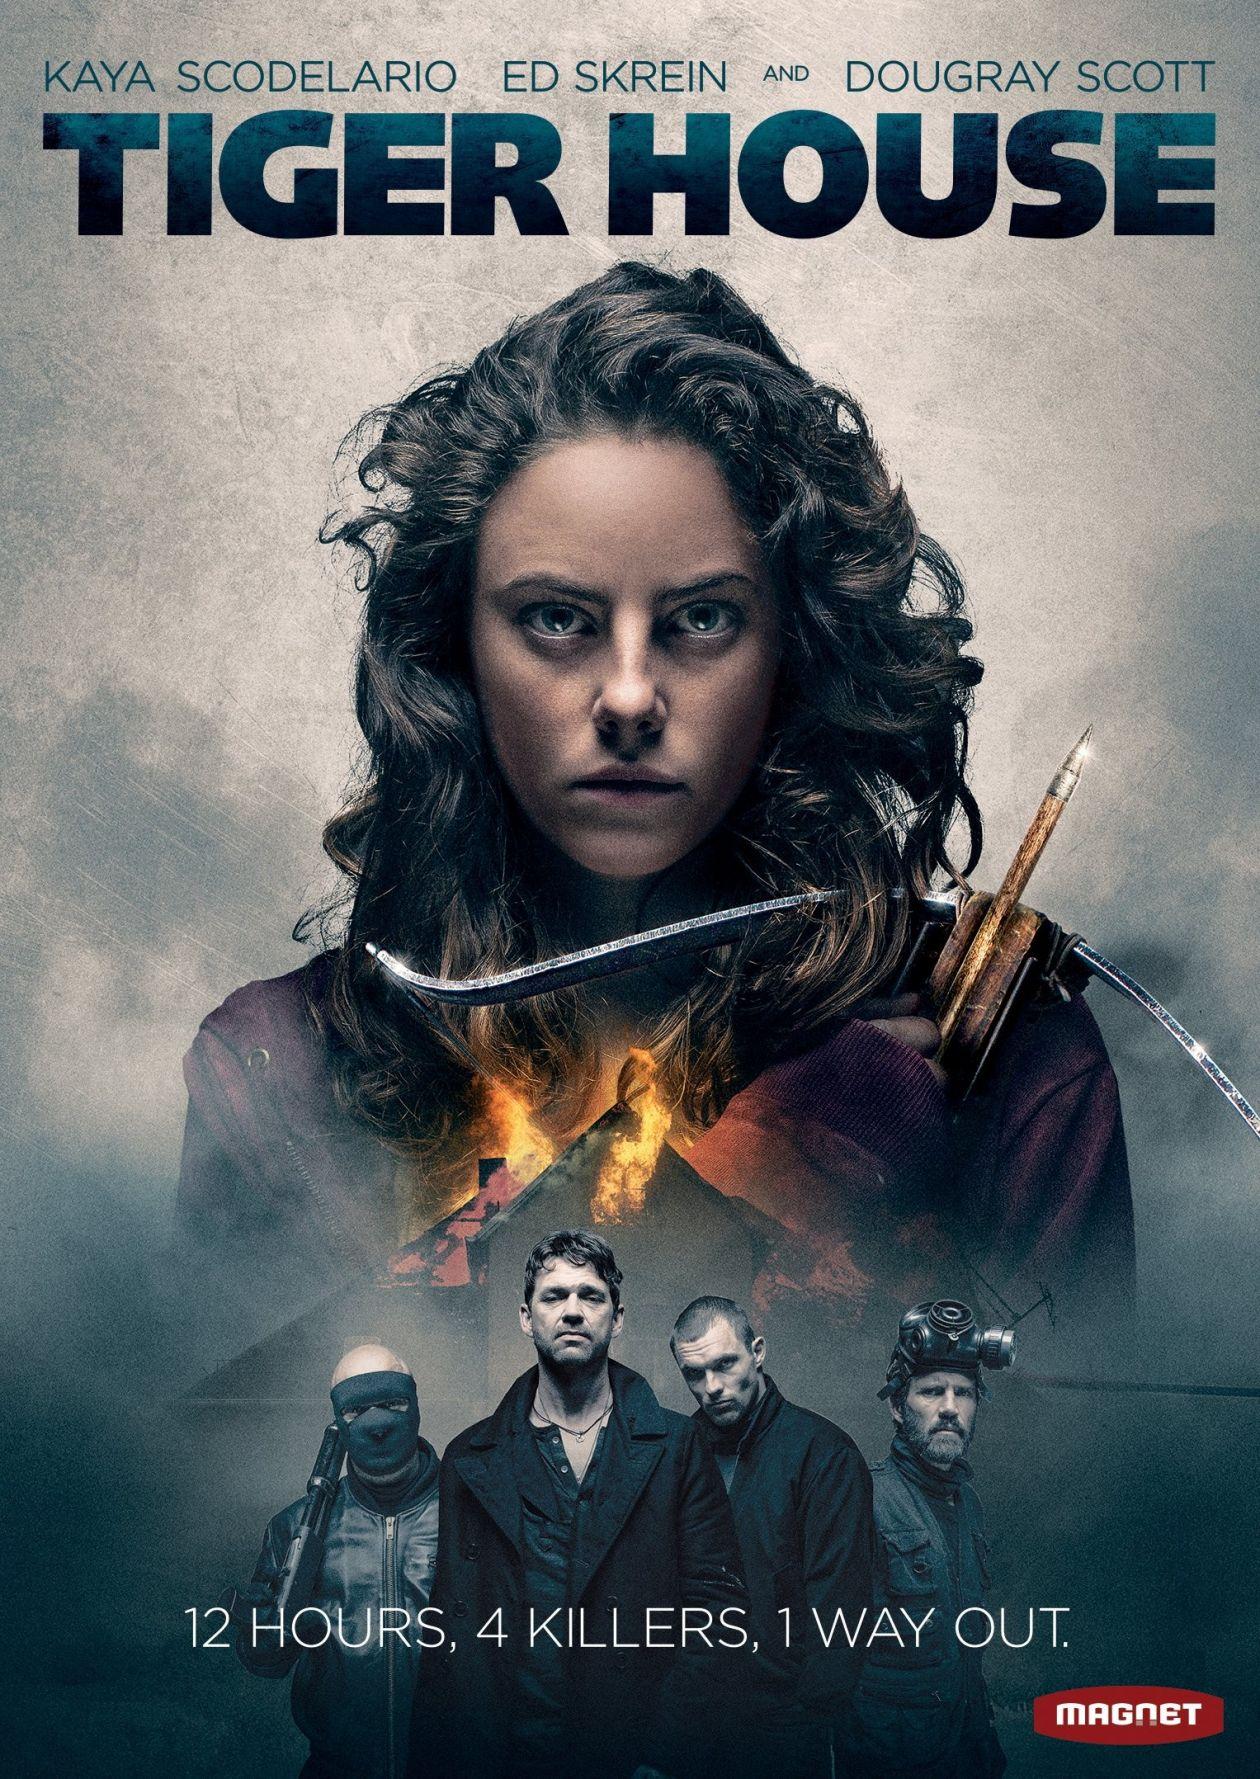 Kaya Scodelario actress   Tiger House / Thomas Daley 2015 Movie Poster Affiche film